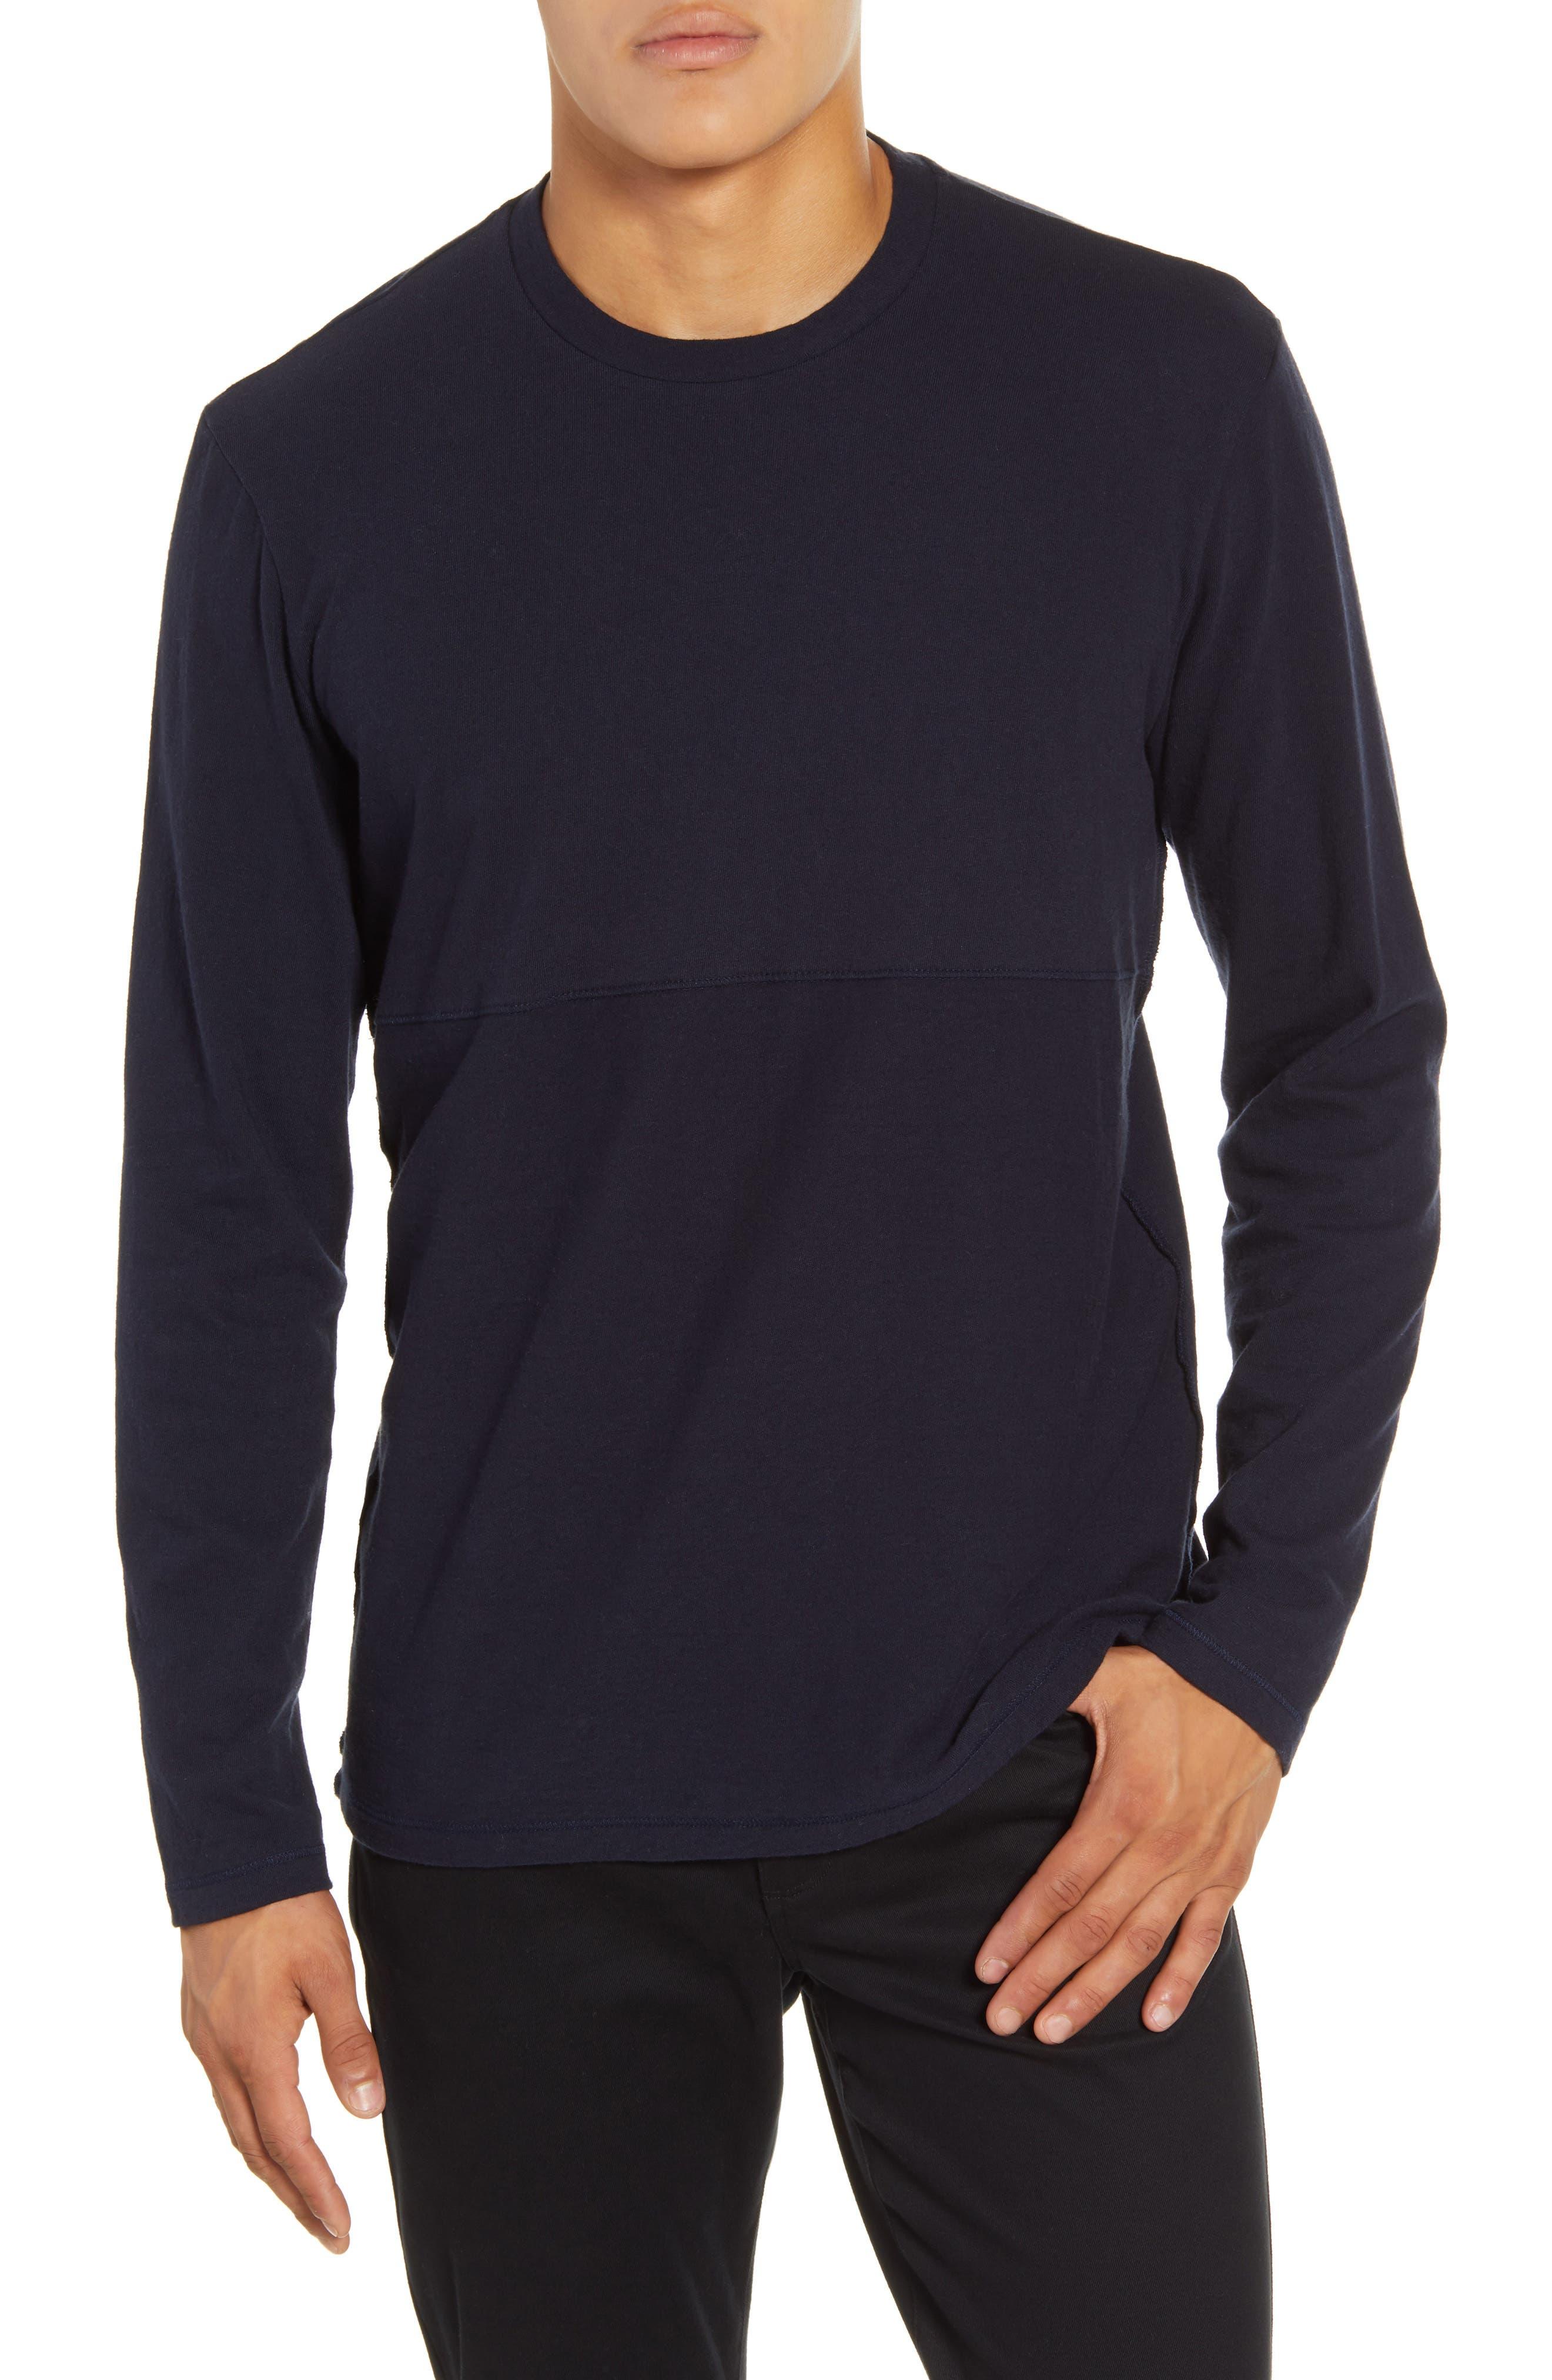 Image of BALDWIN Hugo Slim Fit Long Sleeve T-Shirt